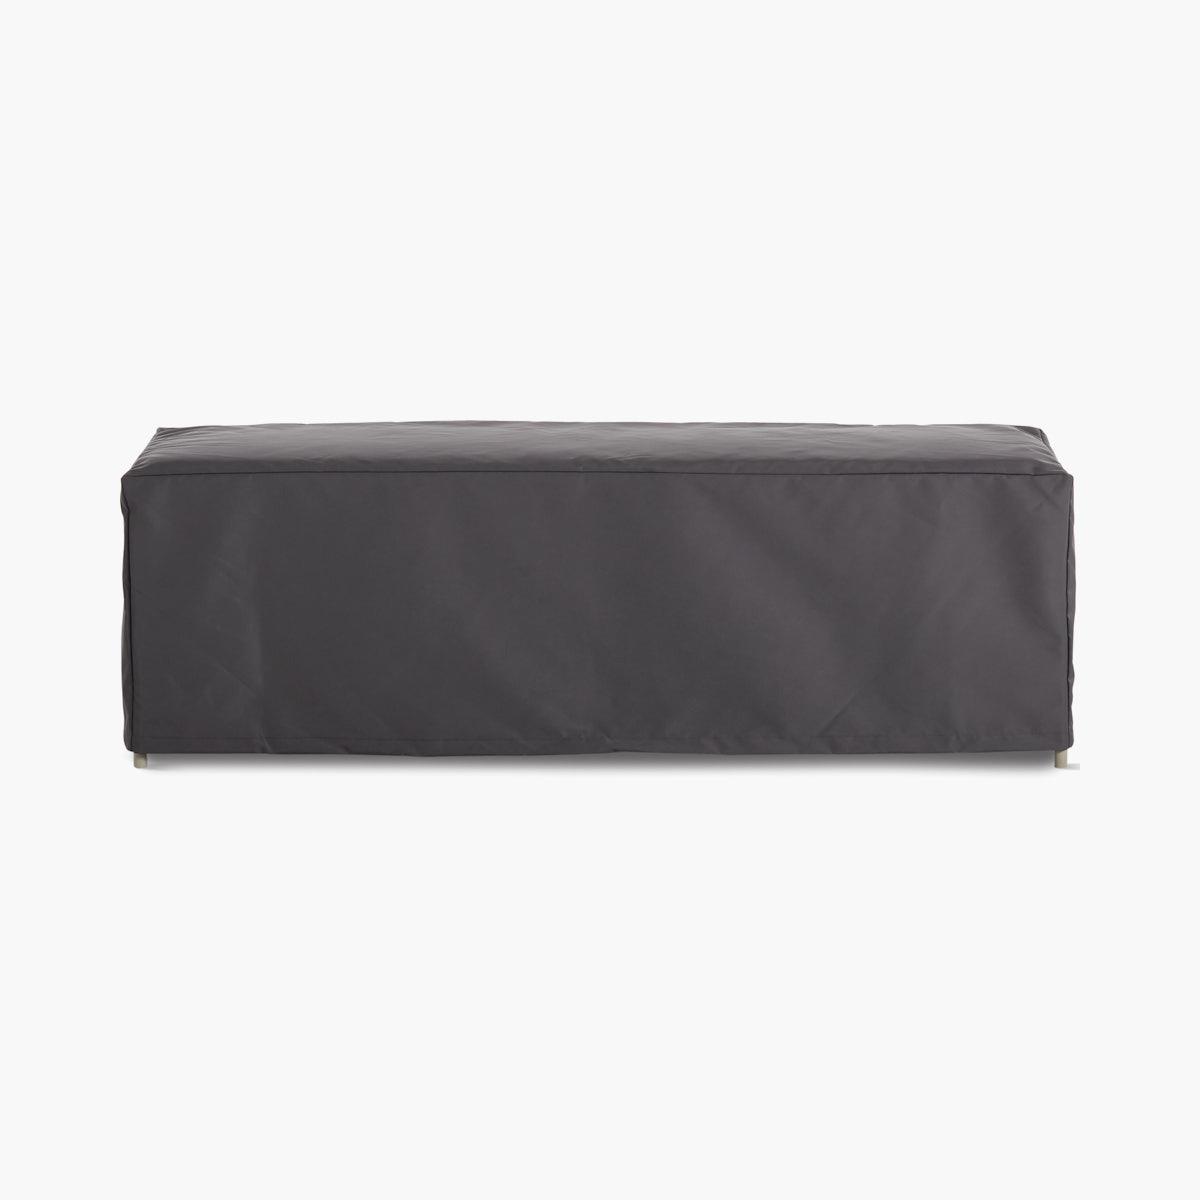 Sommer Bench Cover